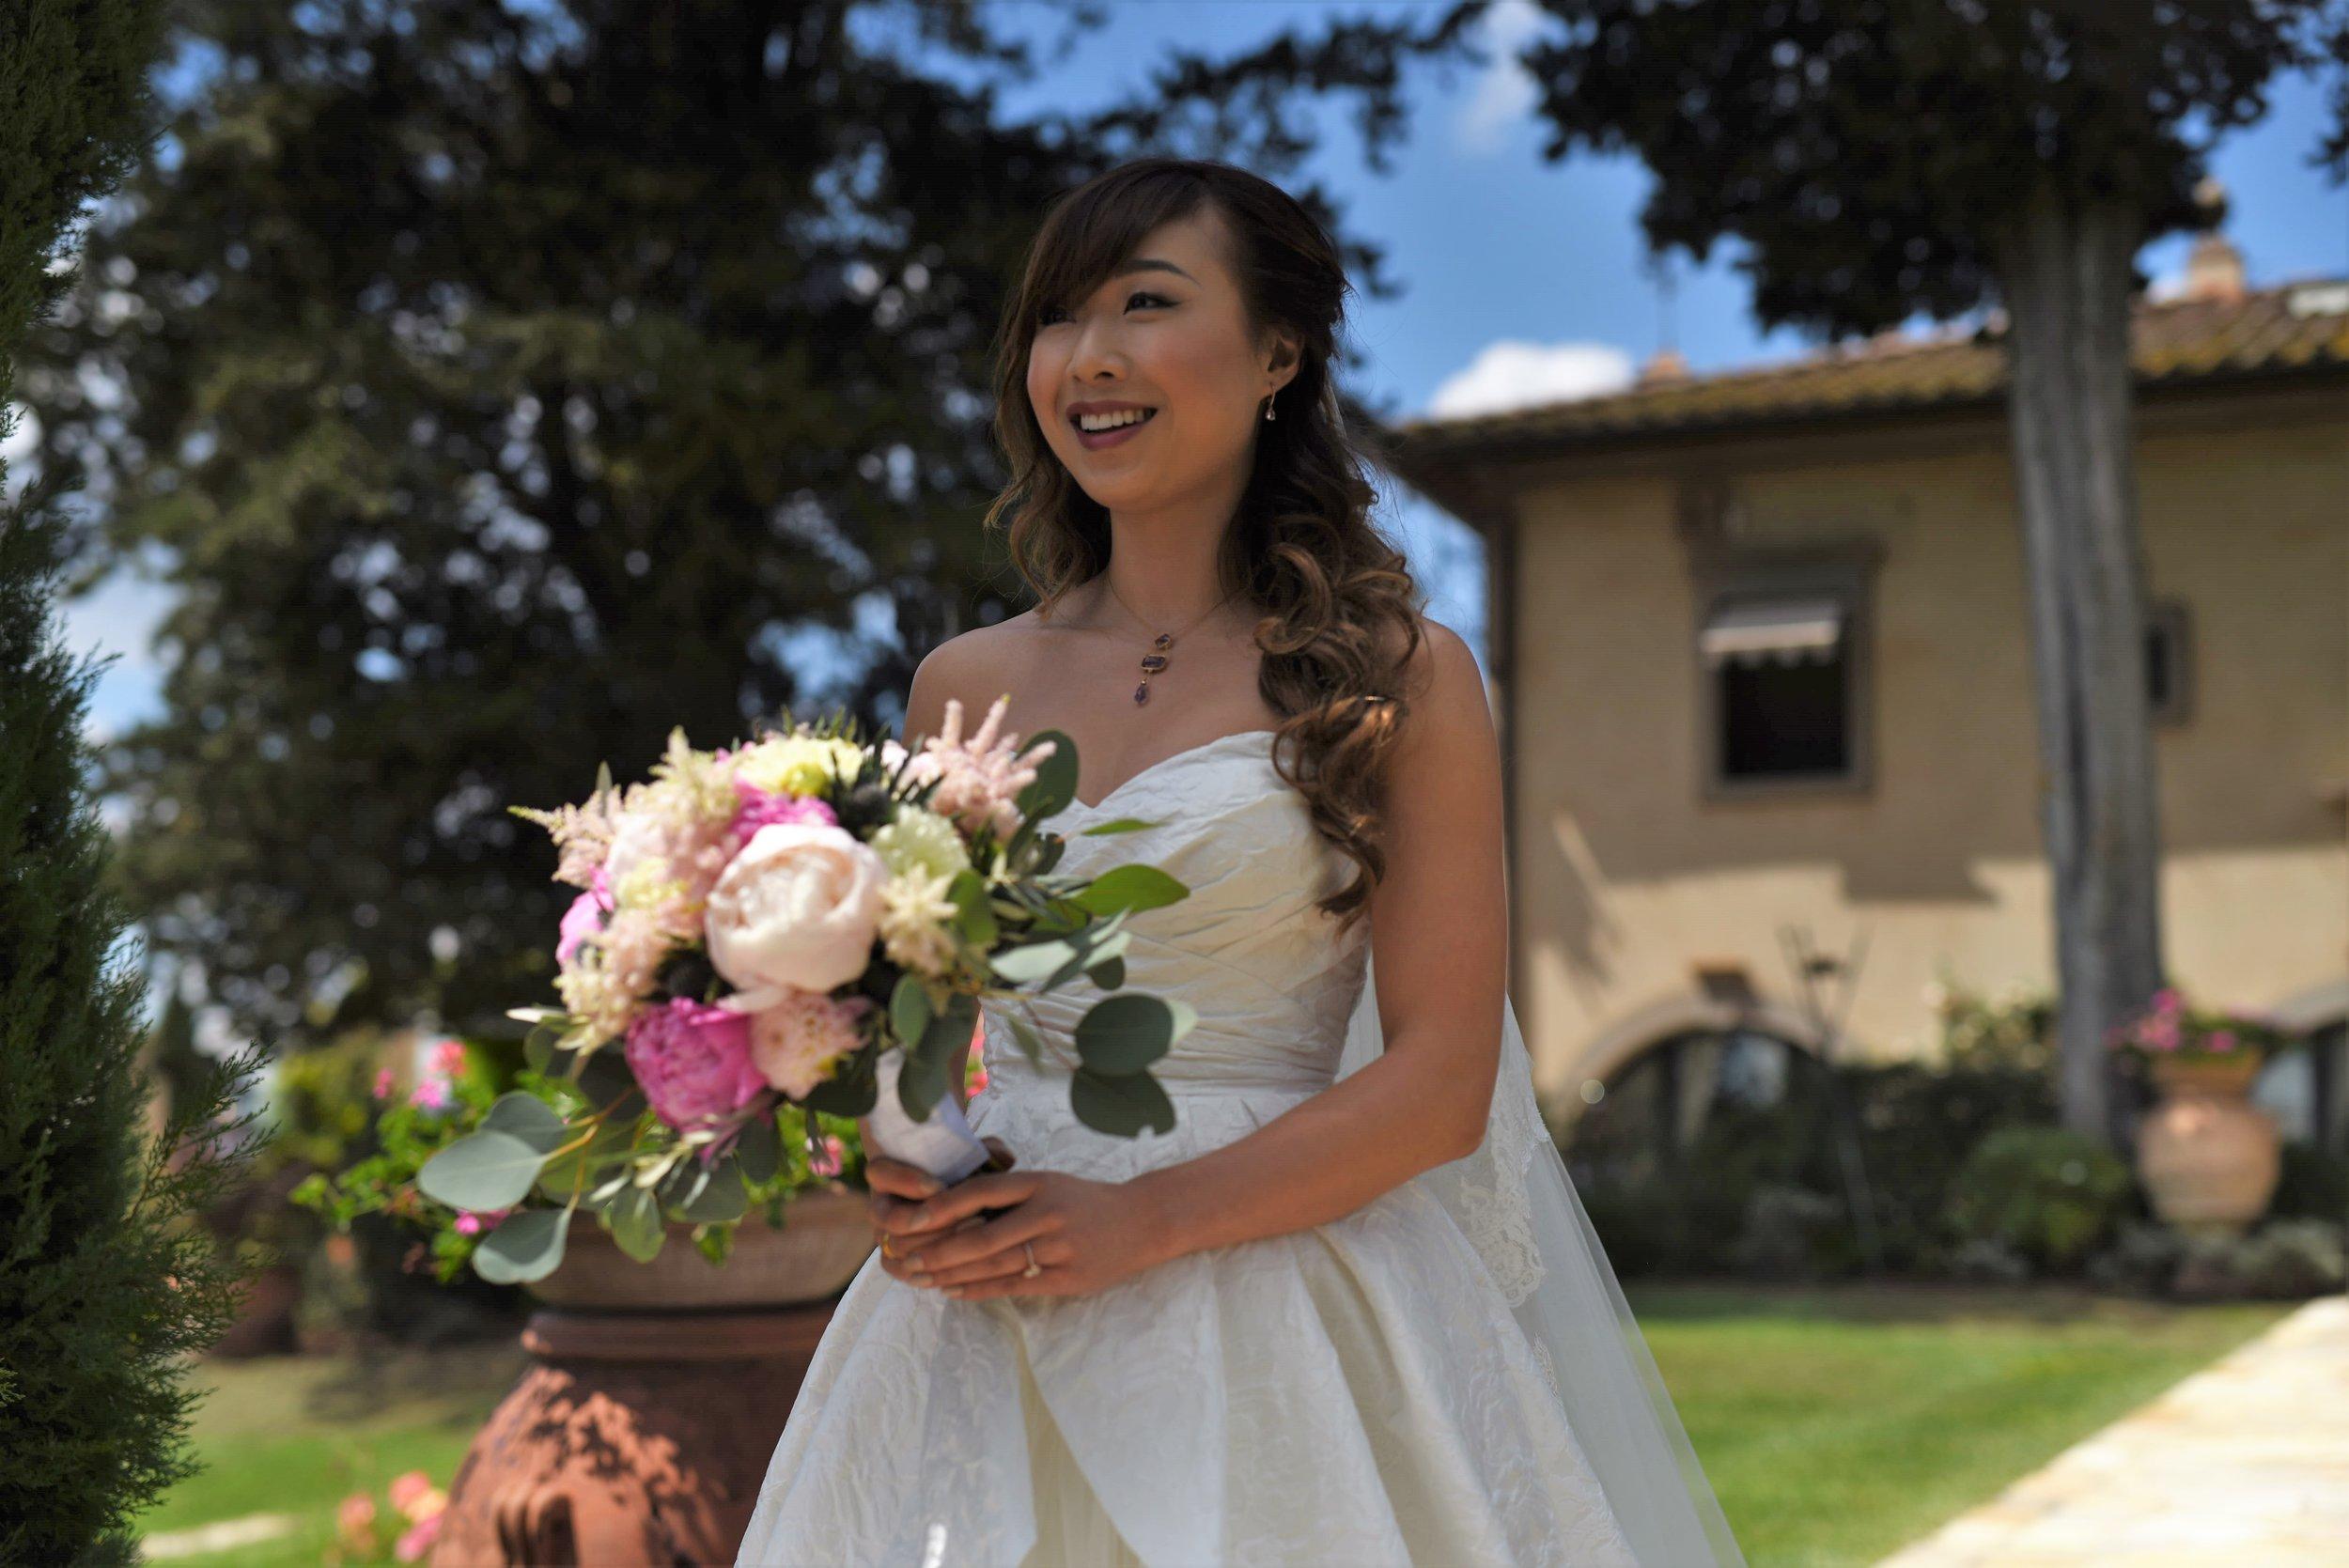 Weddings Abroad